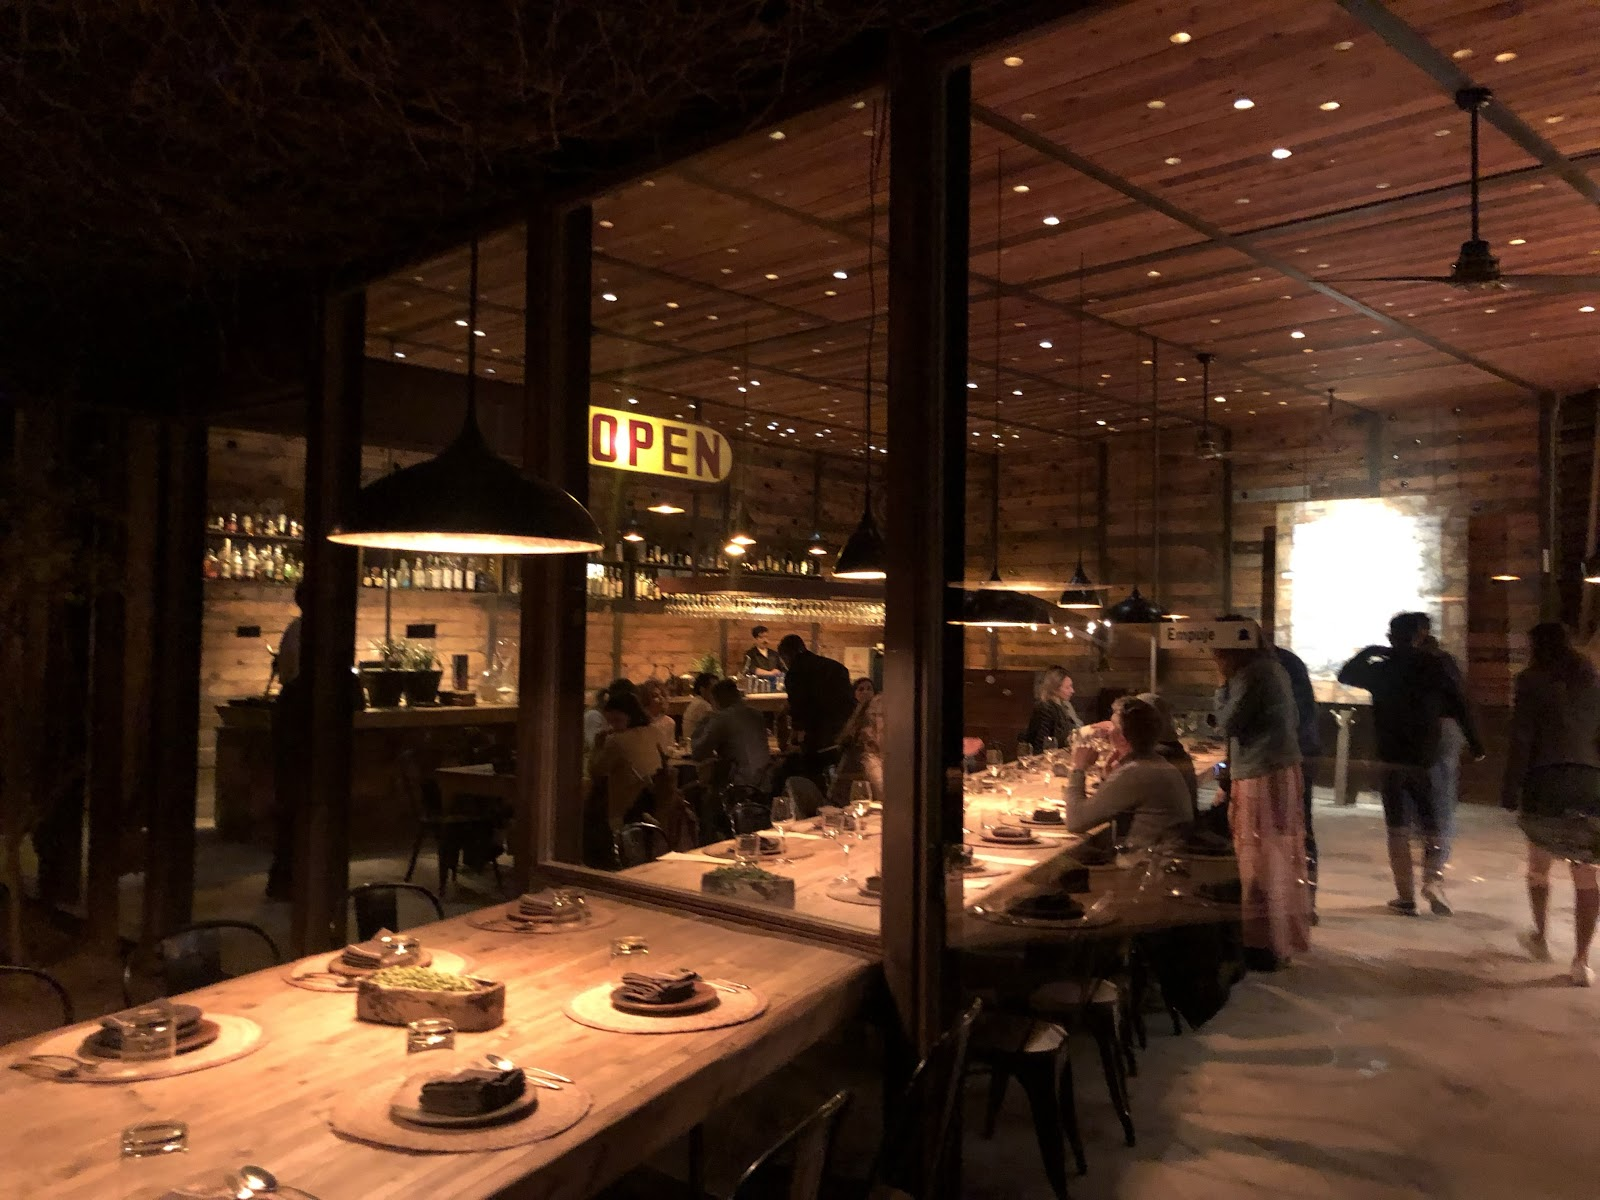 Dinner at Fauna, the 2020 México Gastronómico restaurant of the year.